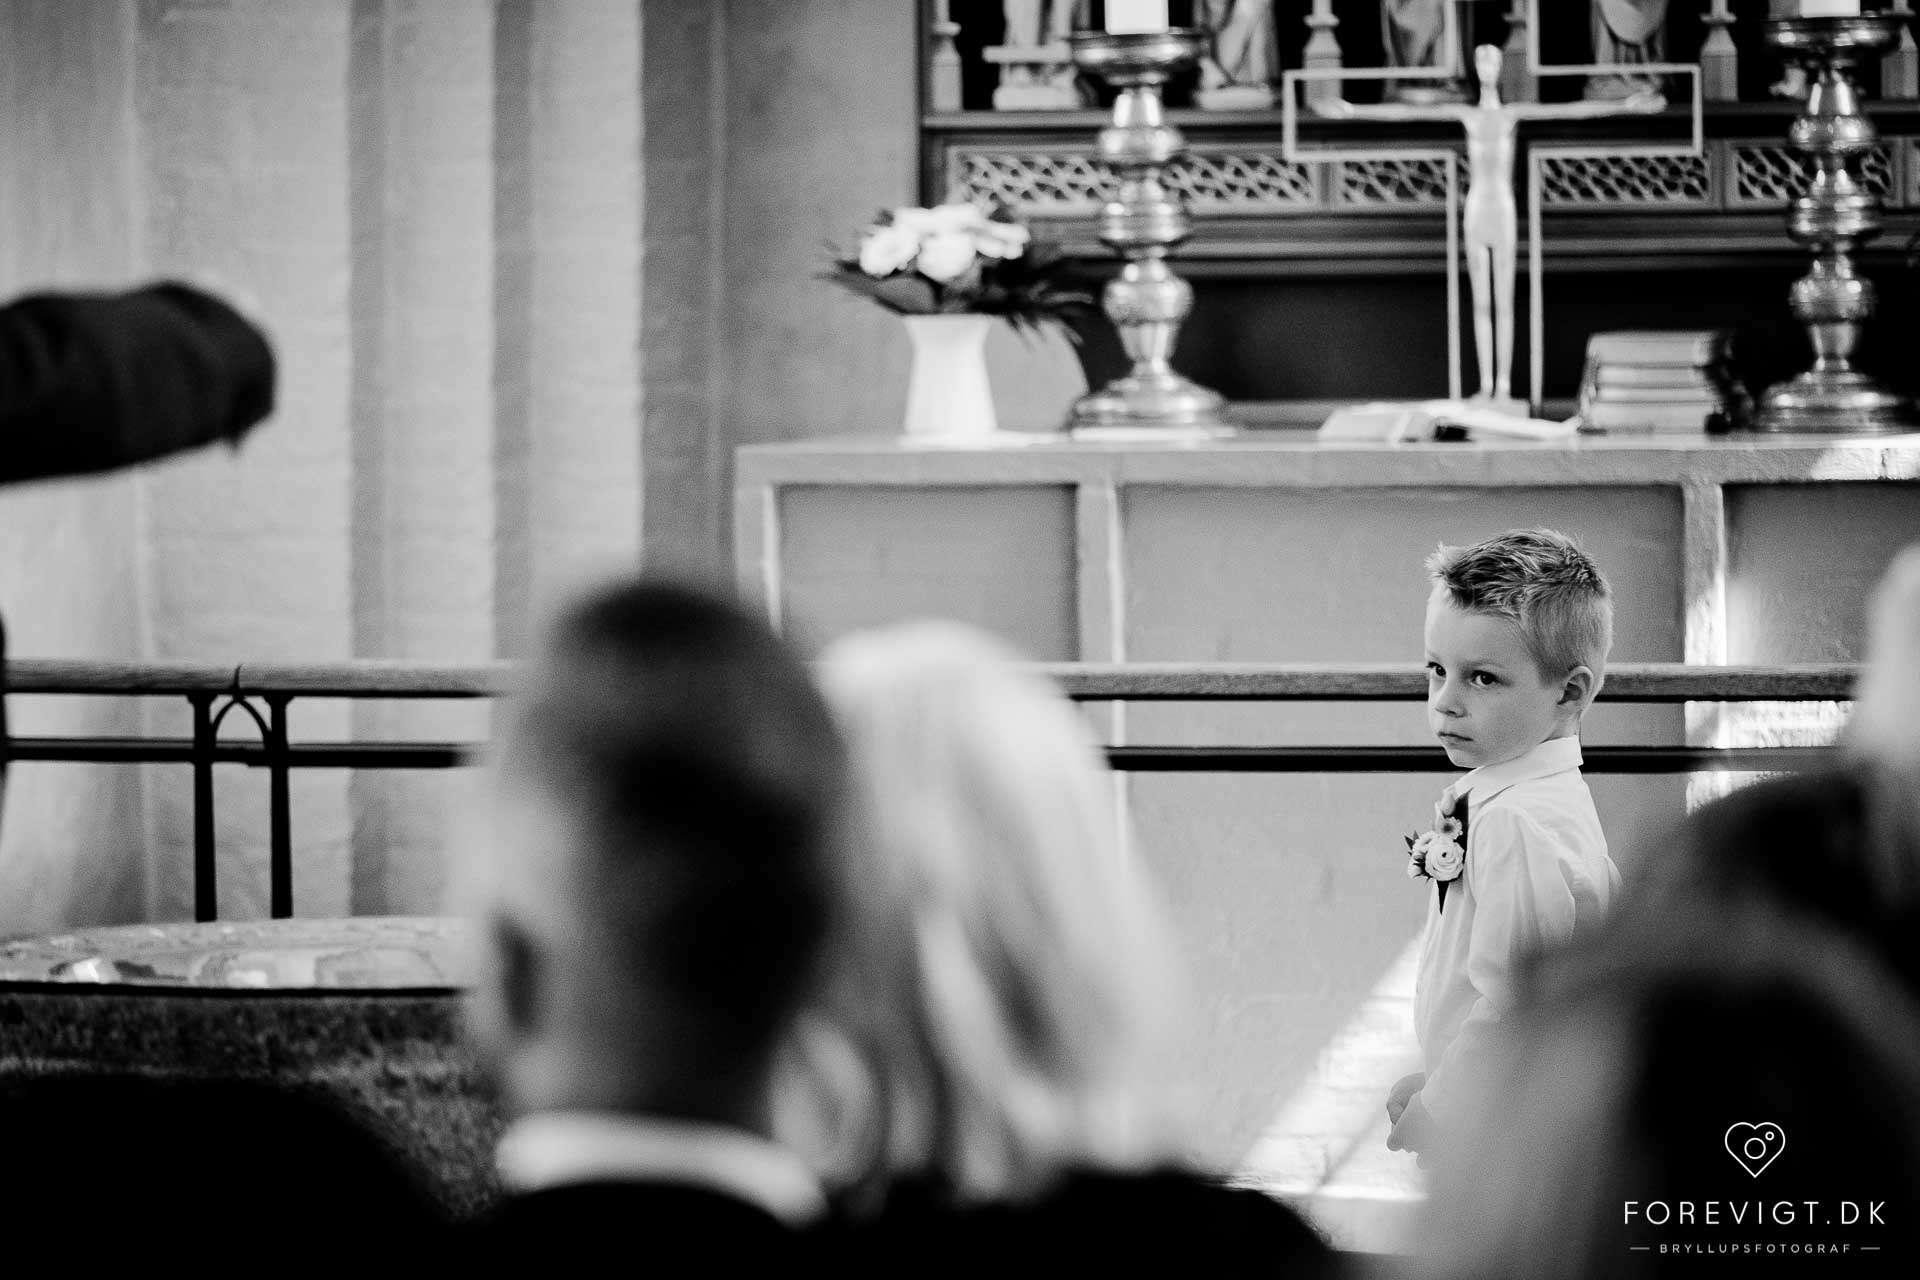 Bryllup i Aarhus - Den smukkeste lokation til brylluper i Aarhus